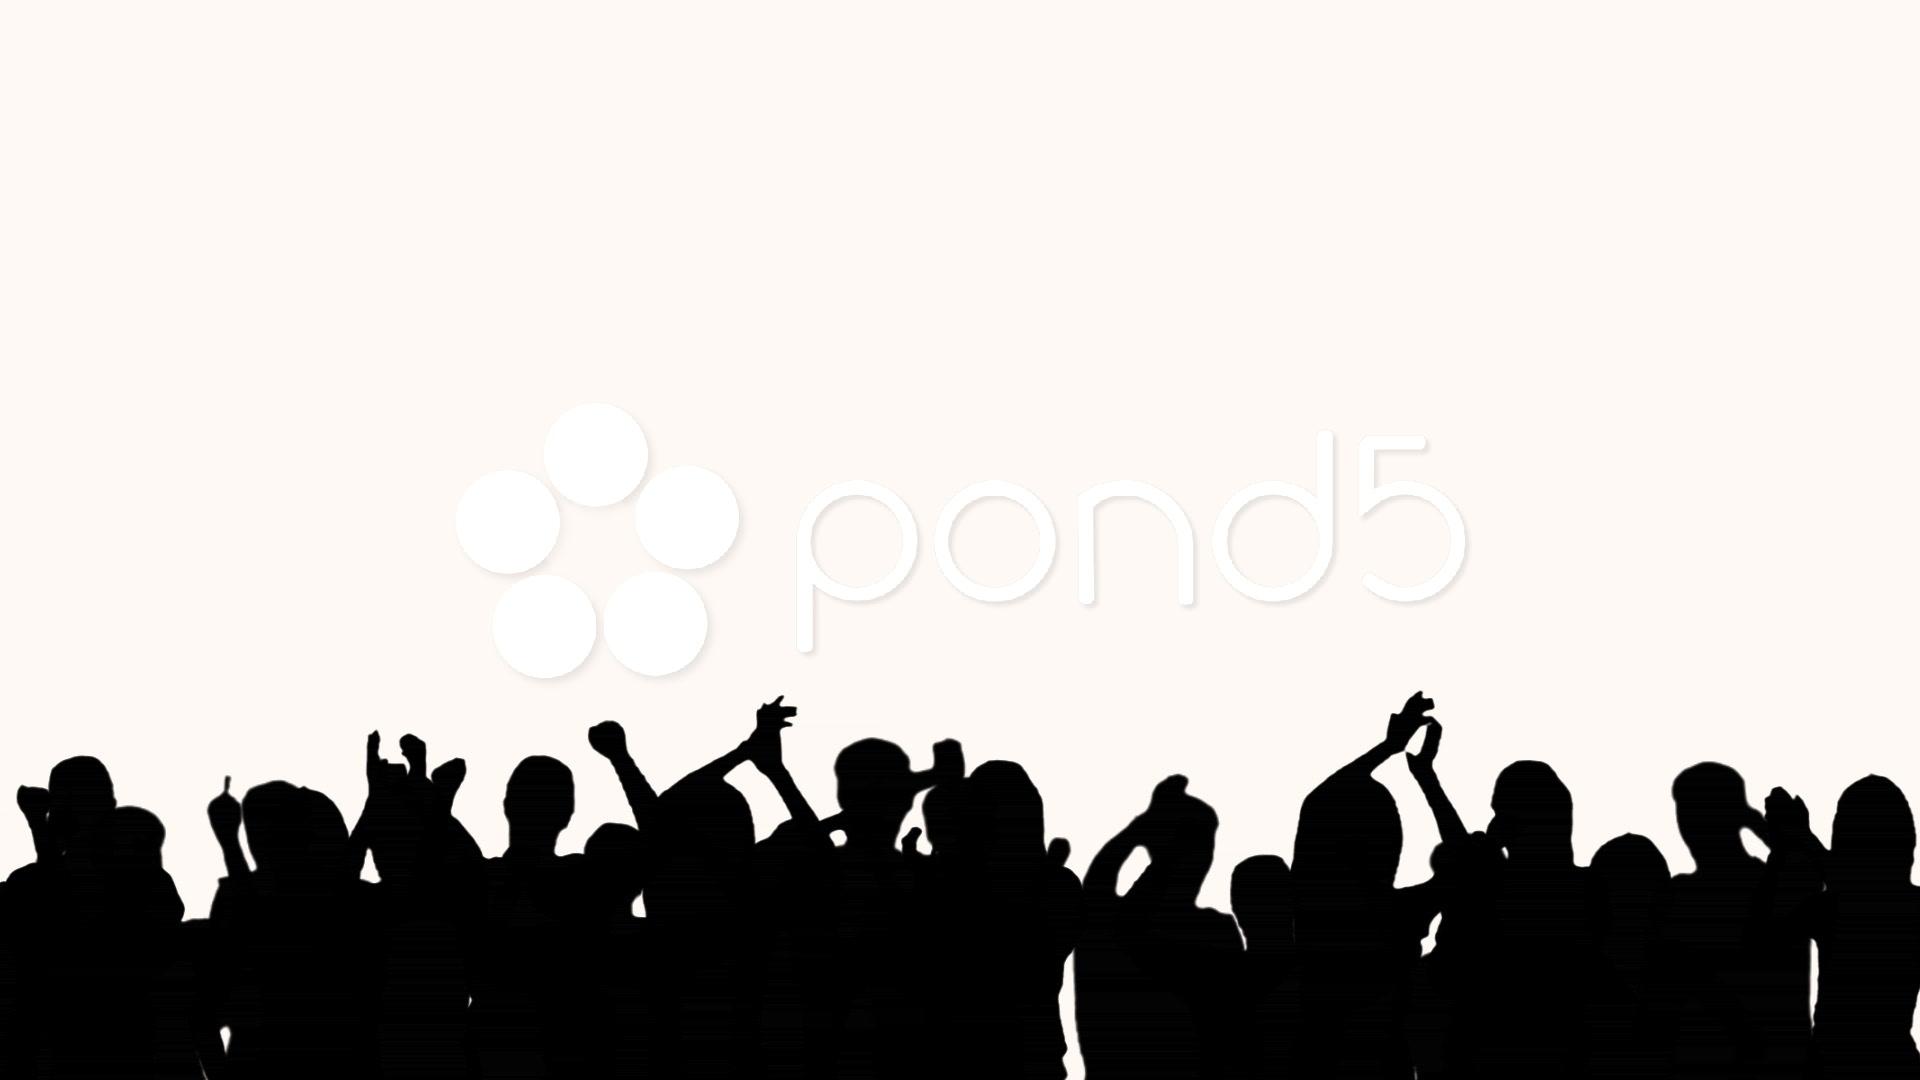 Shadow concert clip art. Audience clipart big crowd